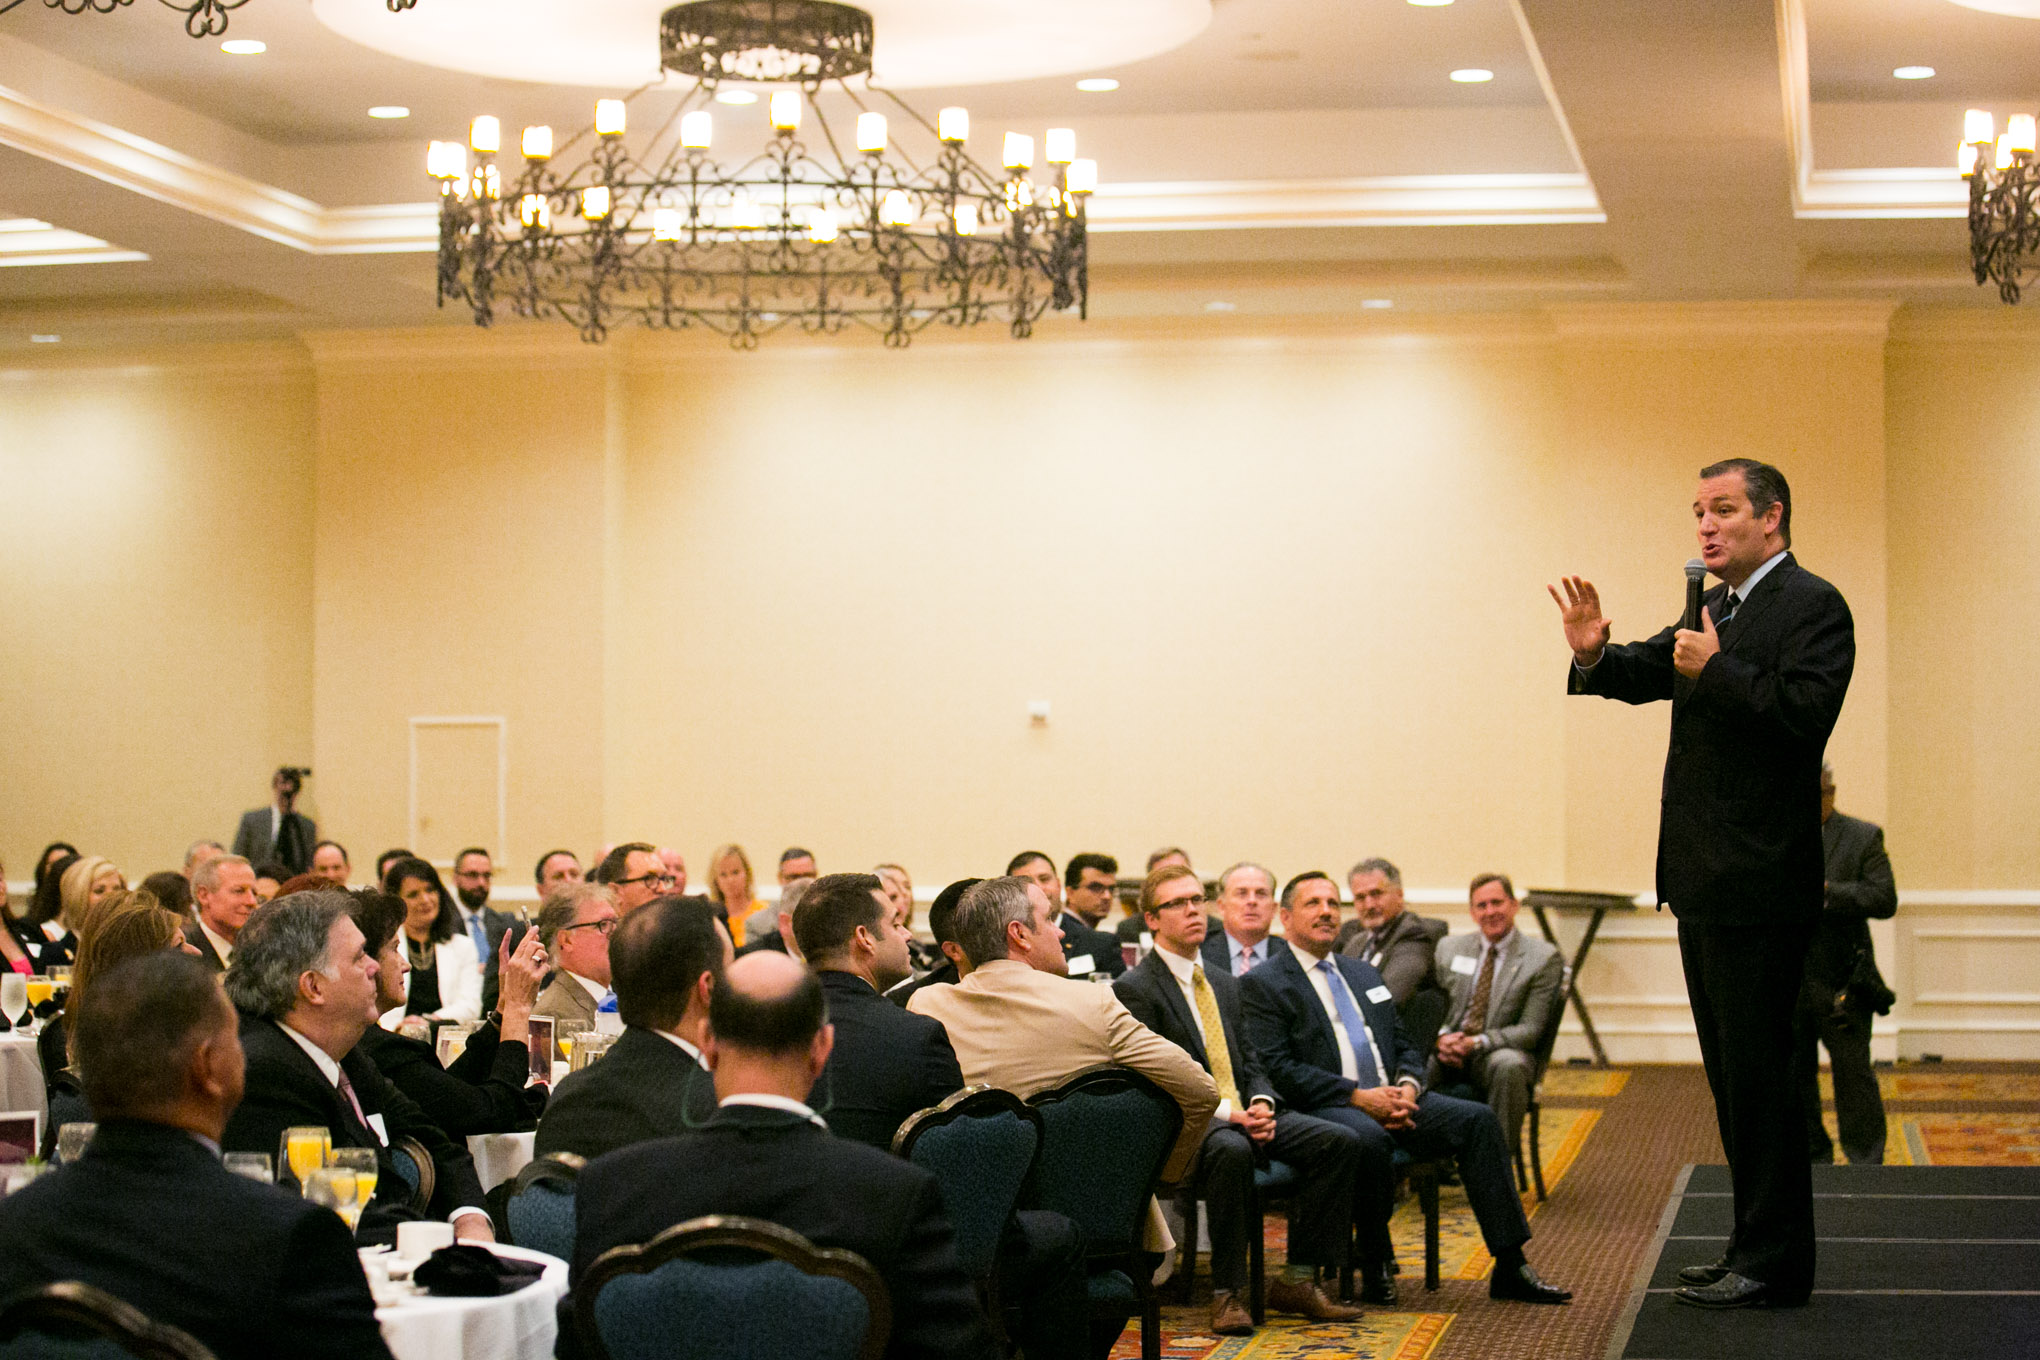 U.S. Sen. Ted Cruz speaks at the 2016 Congressional Series breakfast. Photo by Kathryn Boyd-Batstone.